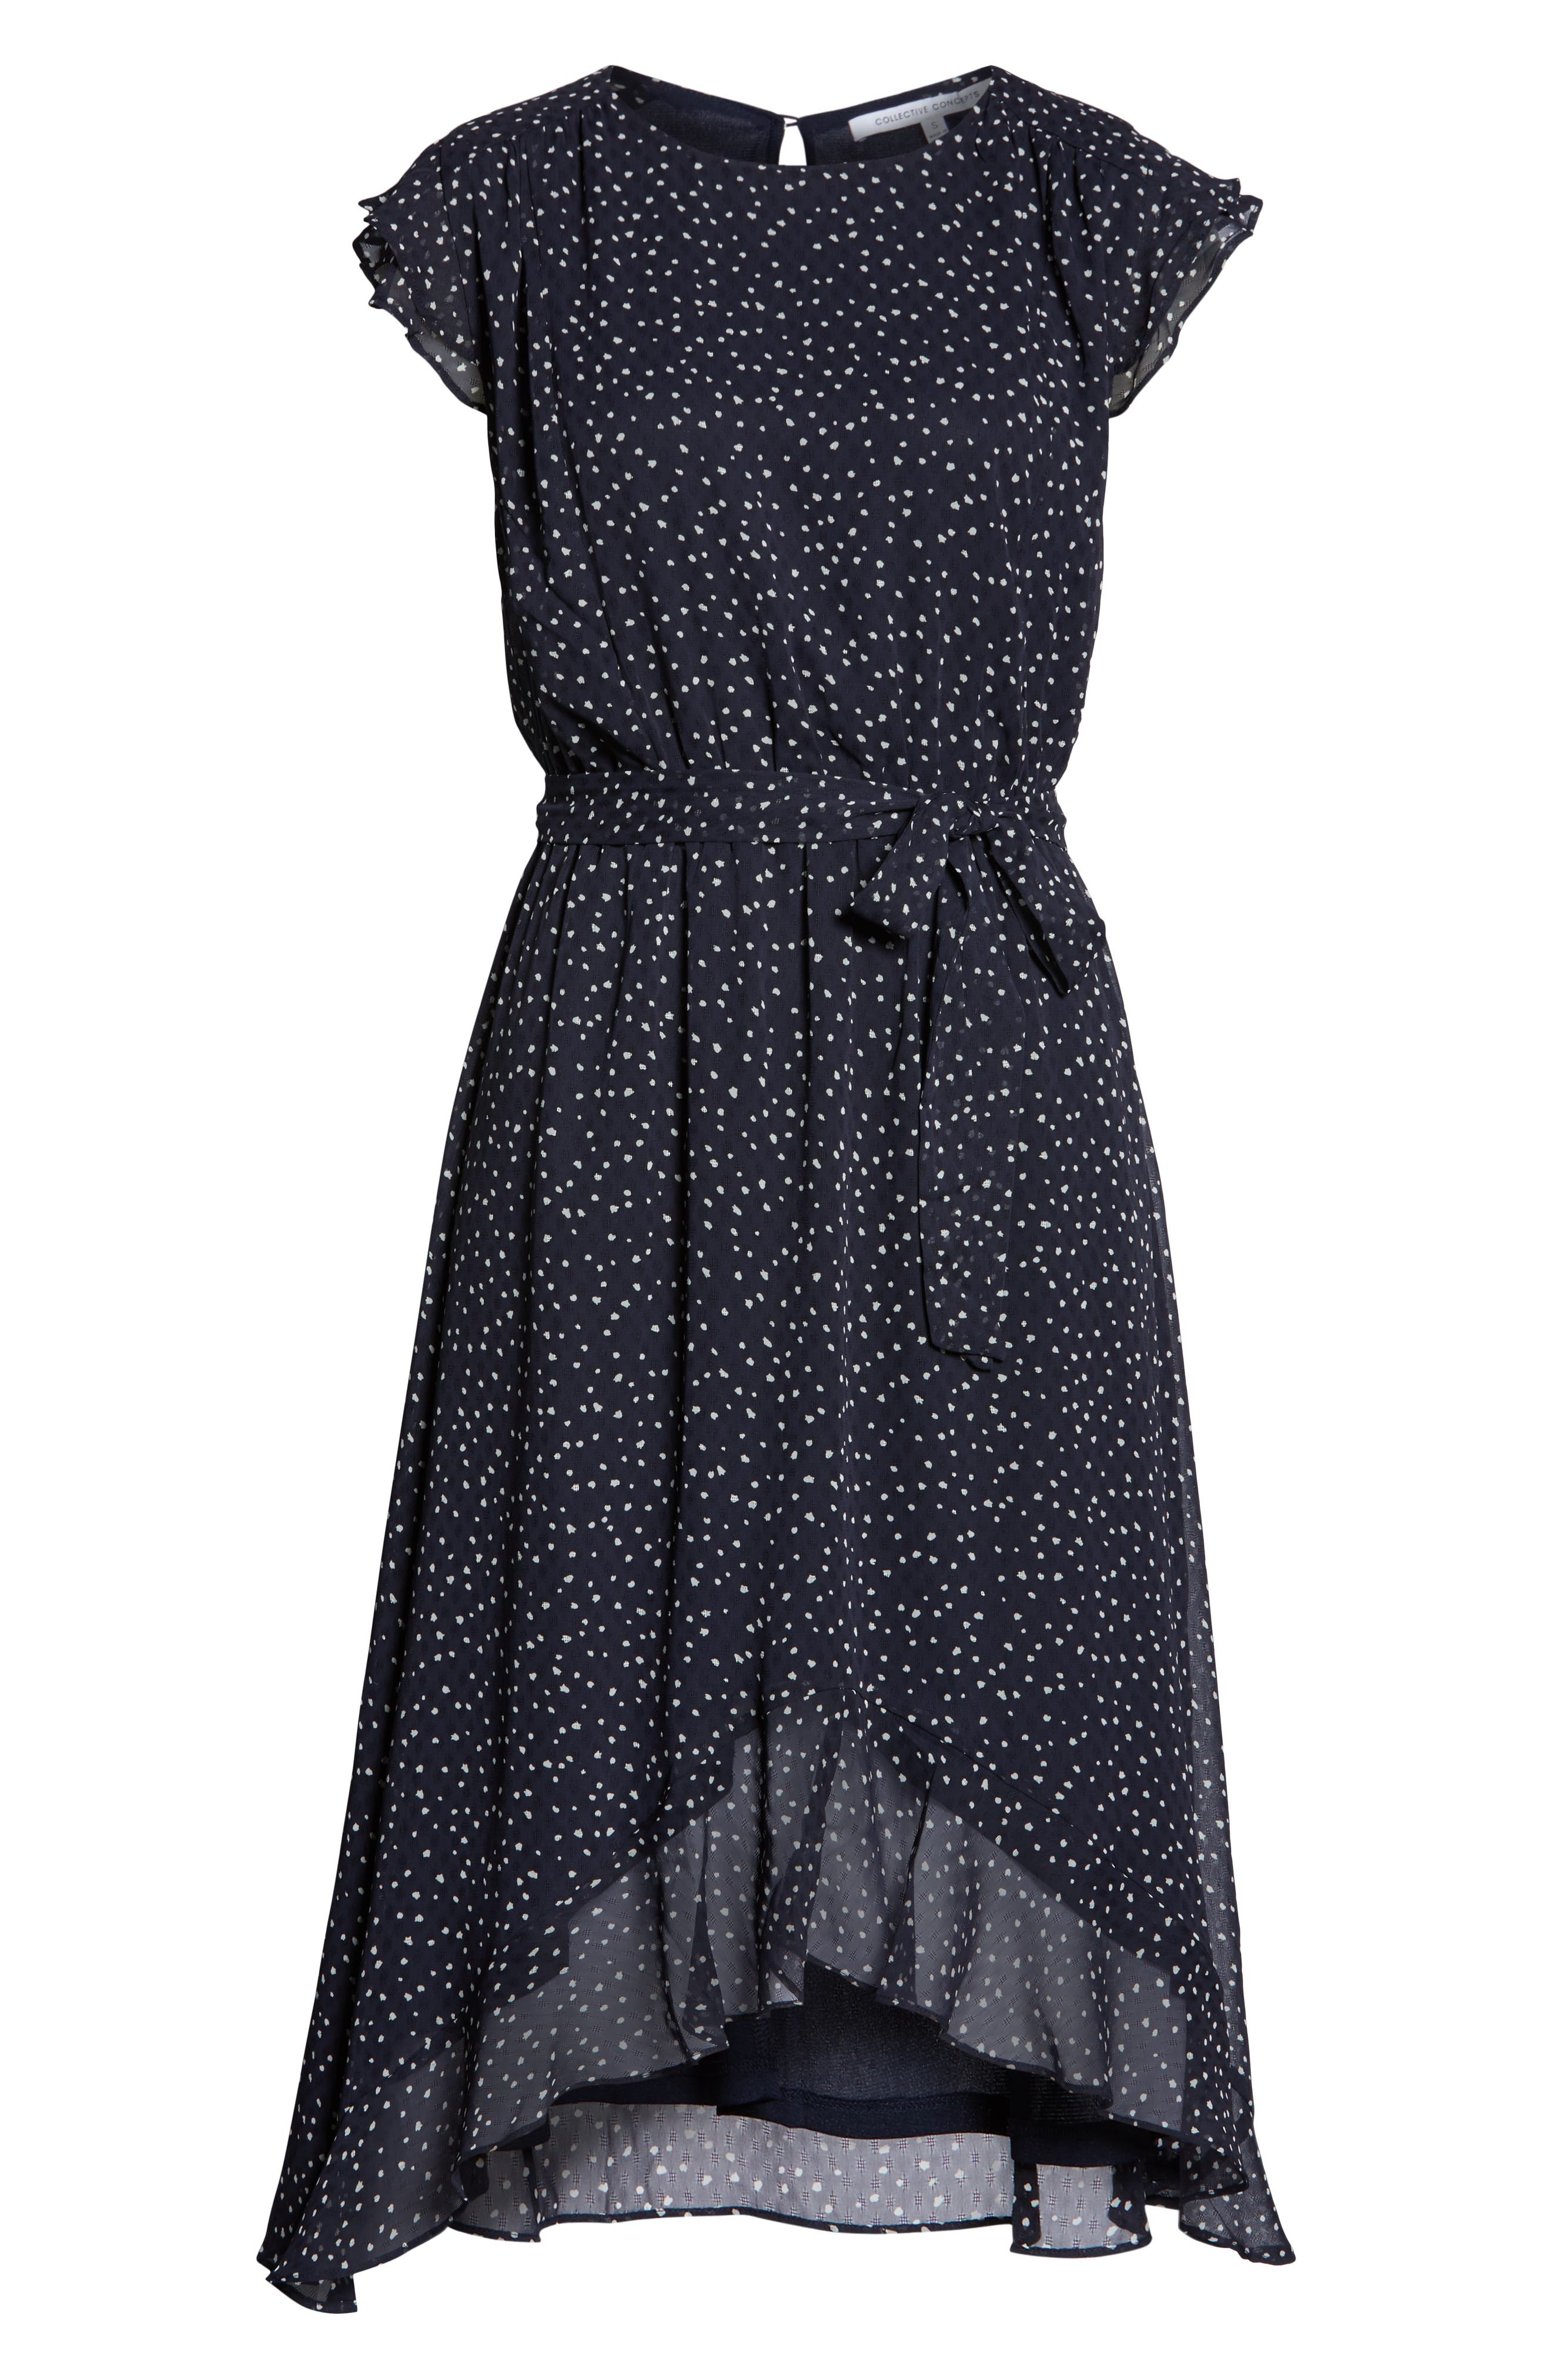 19 COOPER, Polka Dot Ruffle Sleeve Chiffon Dress, Alternate thumbnail 6, color, 400